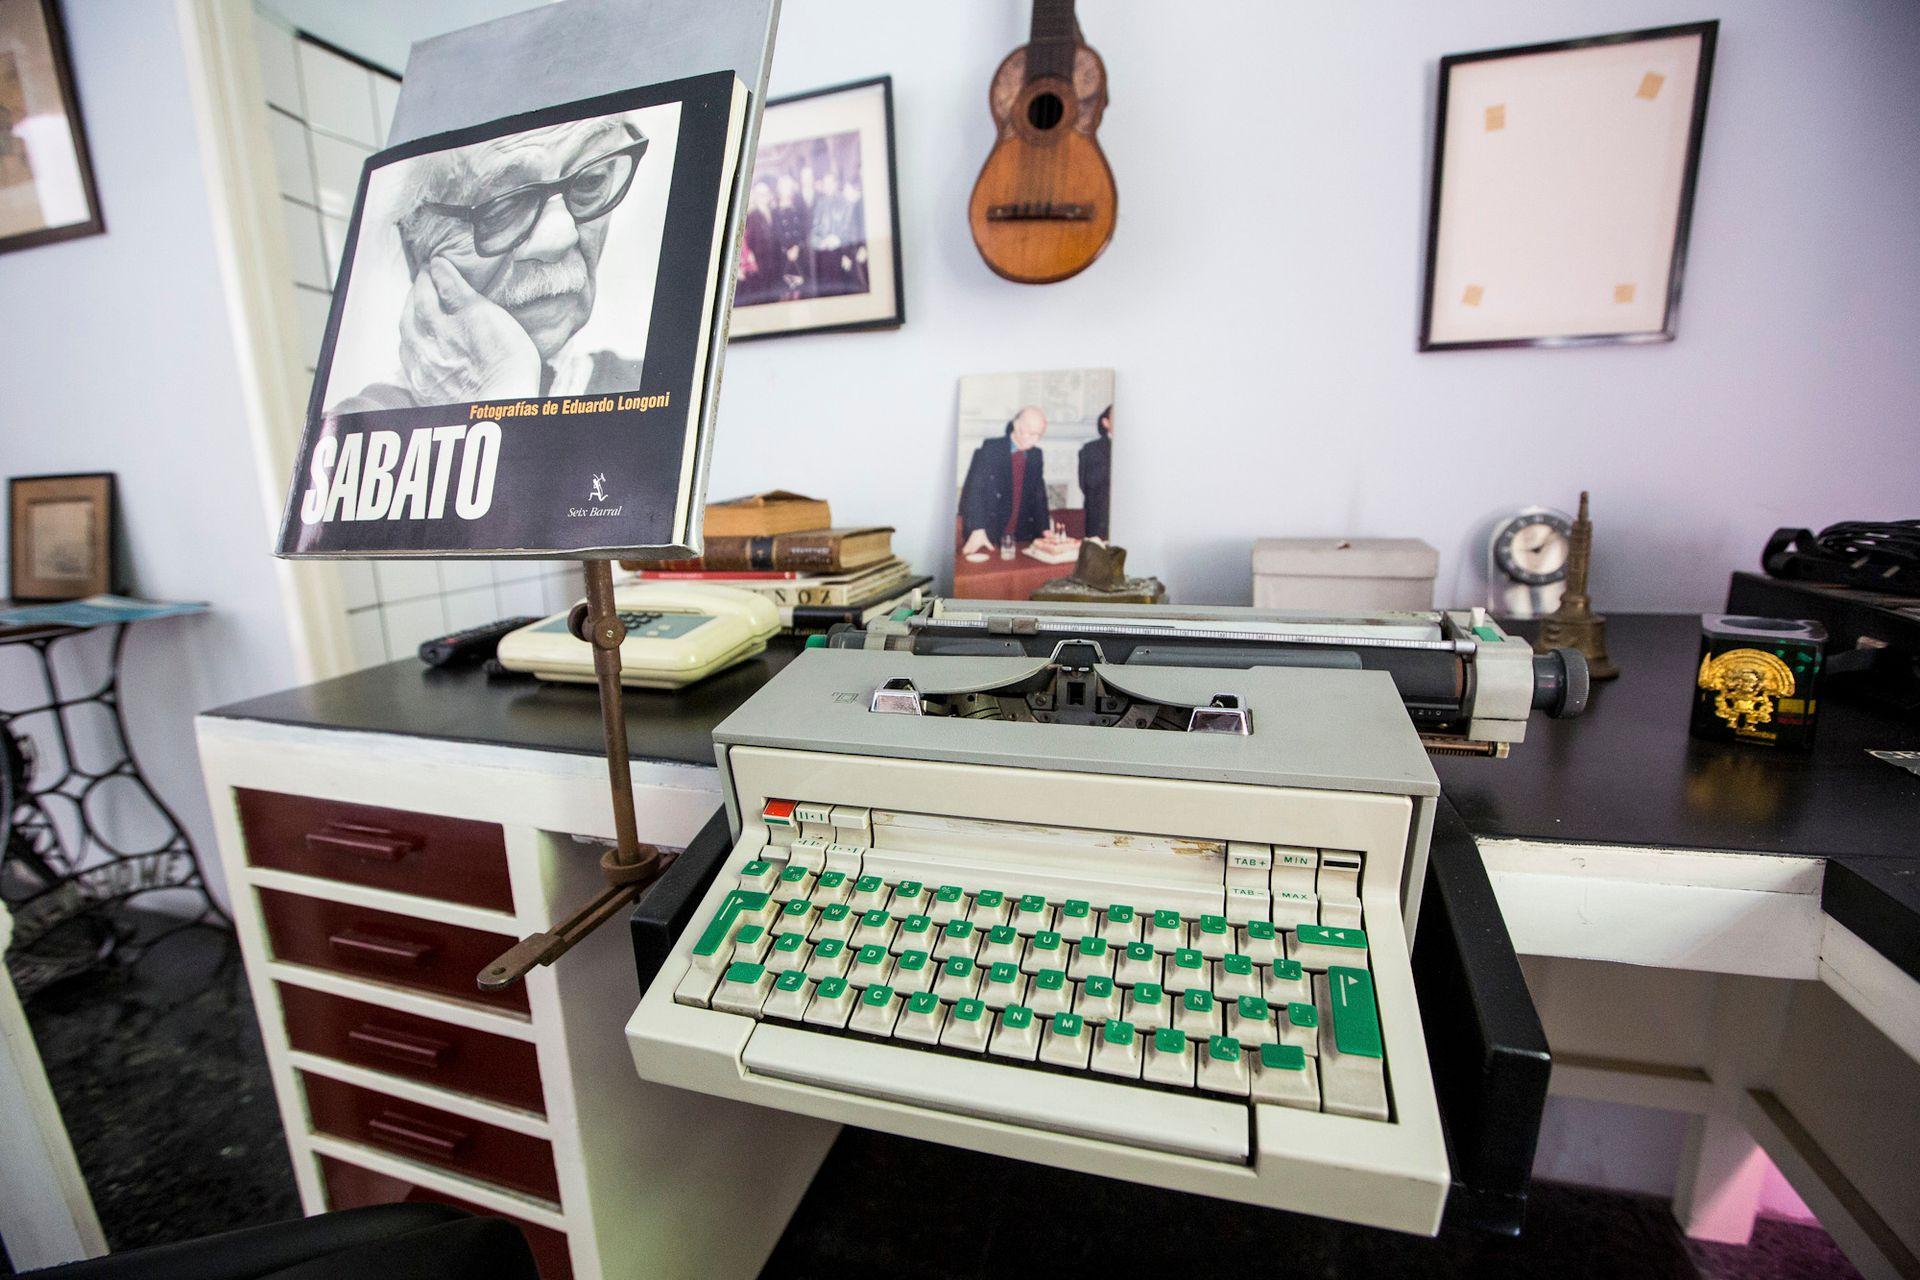 Un escritorio con otra máquina de escribir